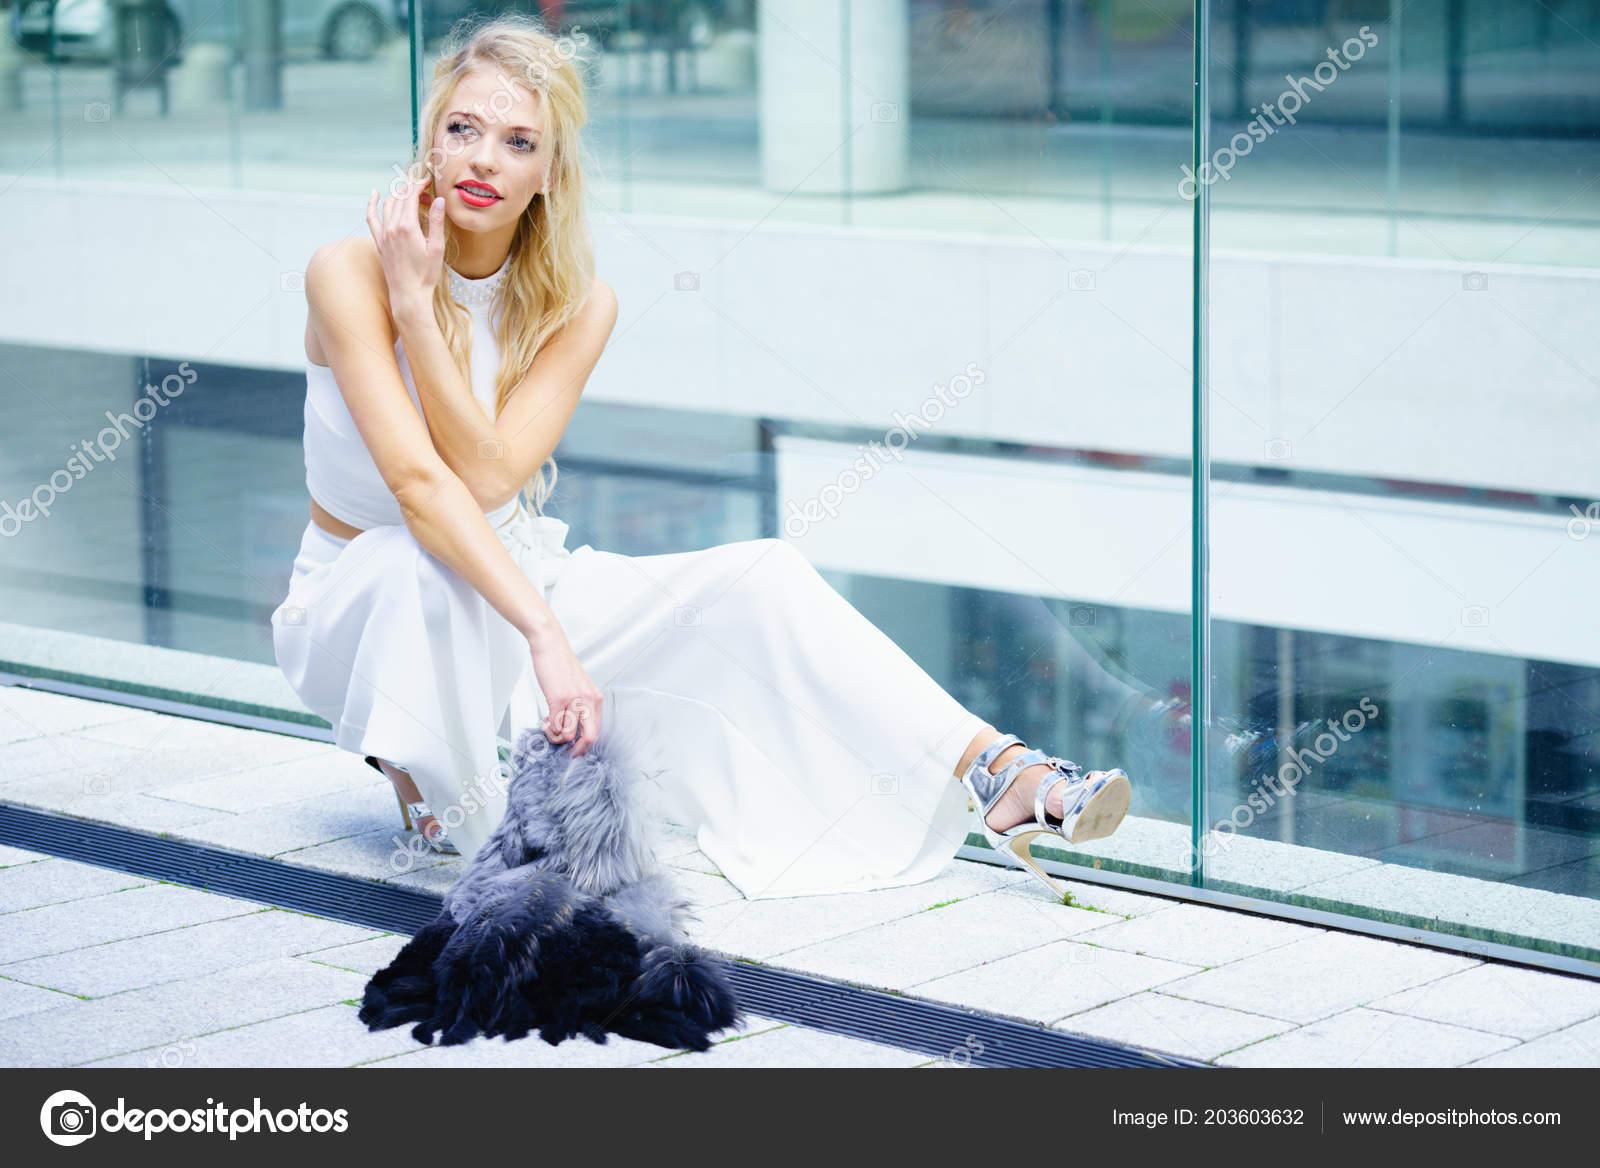 05db441cd226 Κομψά Μοντέρνα Γυναίκα Παρουσιάζει Μοντέρνο Αστικό Ντύσιμο Λευκό Crop Top —  Φωτογραφία Αρχείου